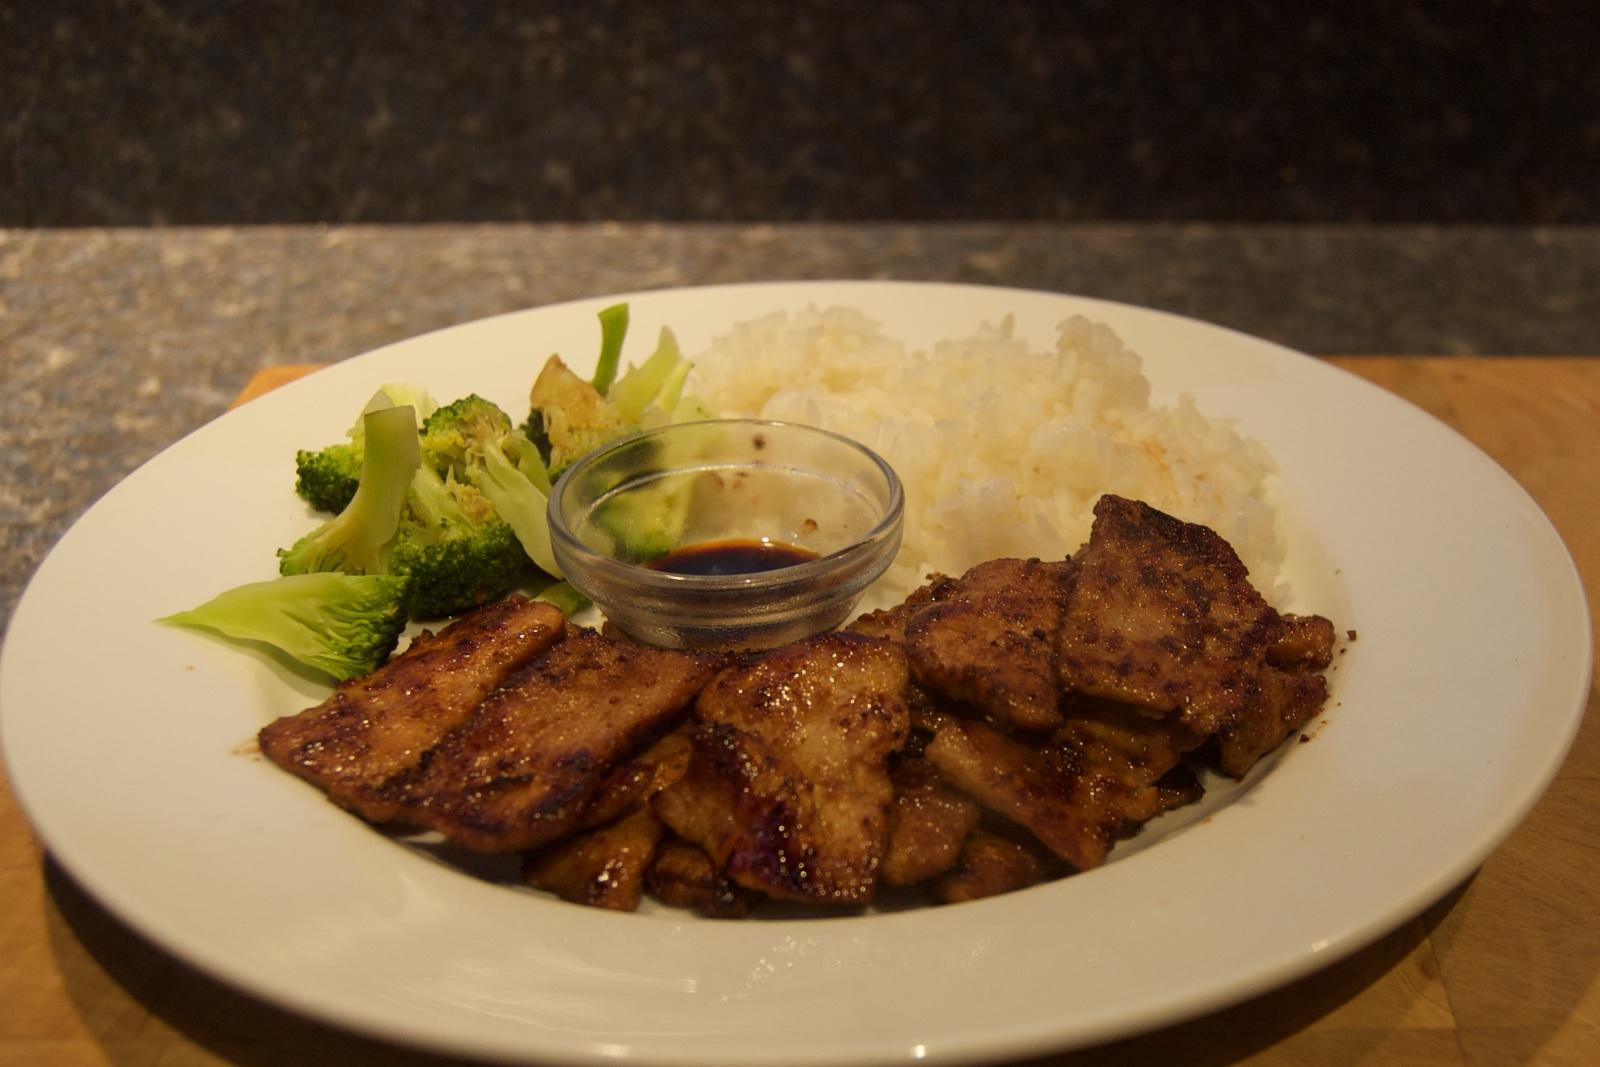 http://blog.rickk.com/food/2017/01/04/ate.2017.01.02.d.jpg